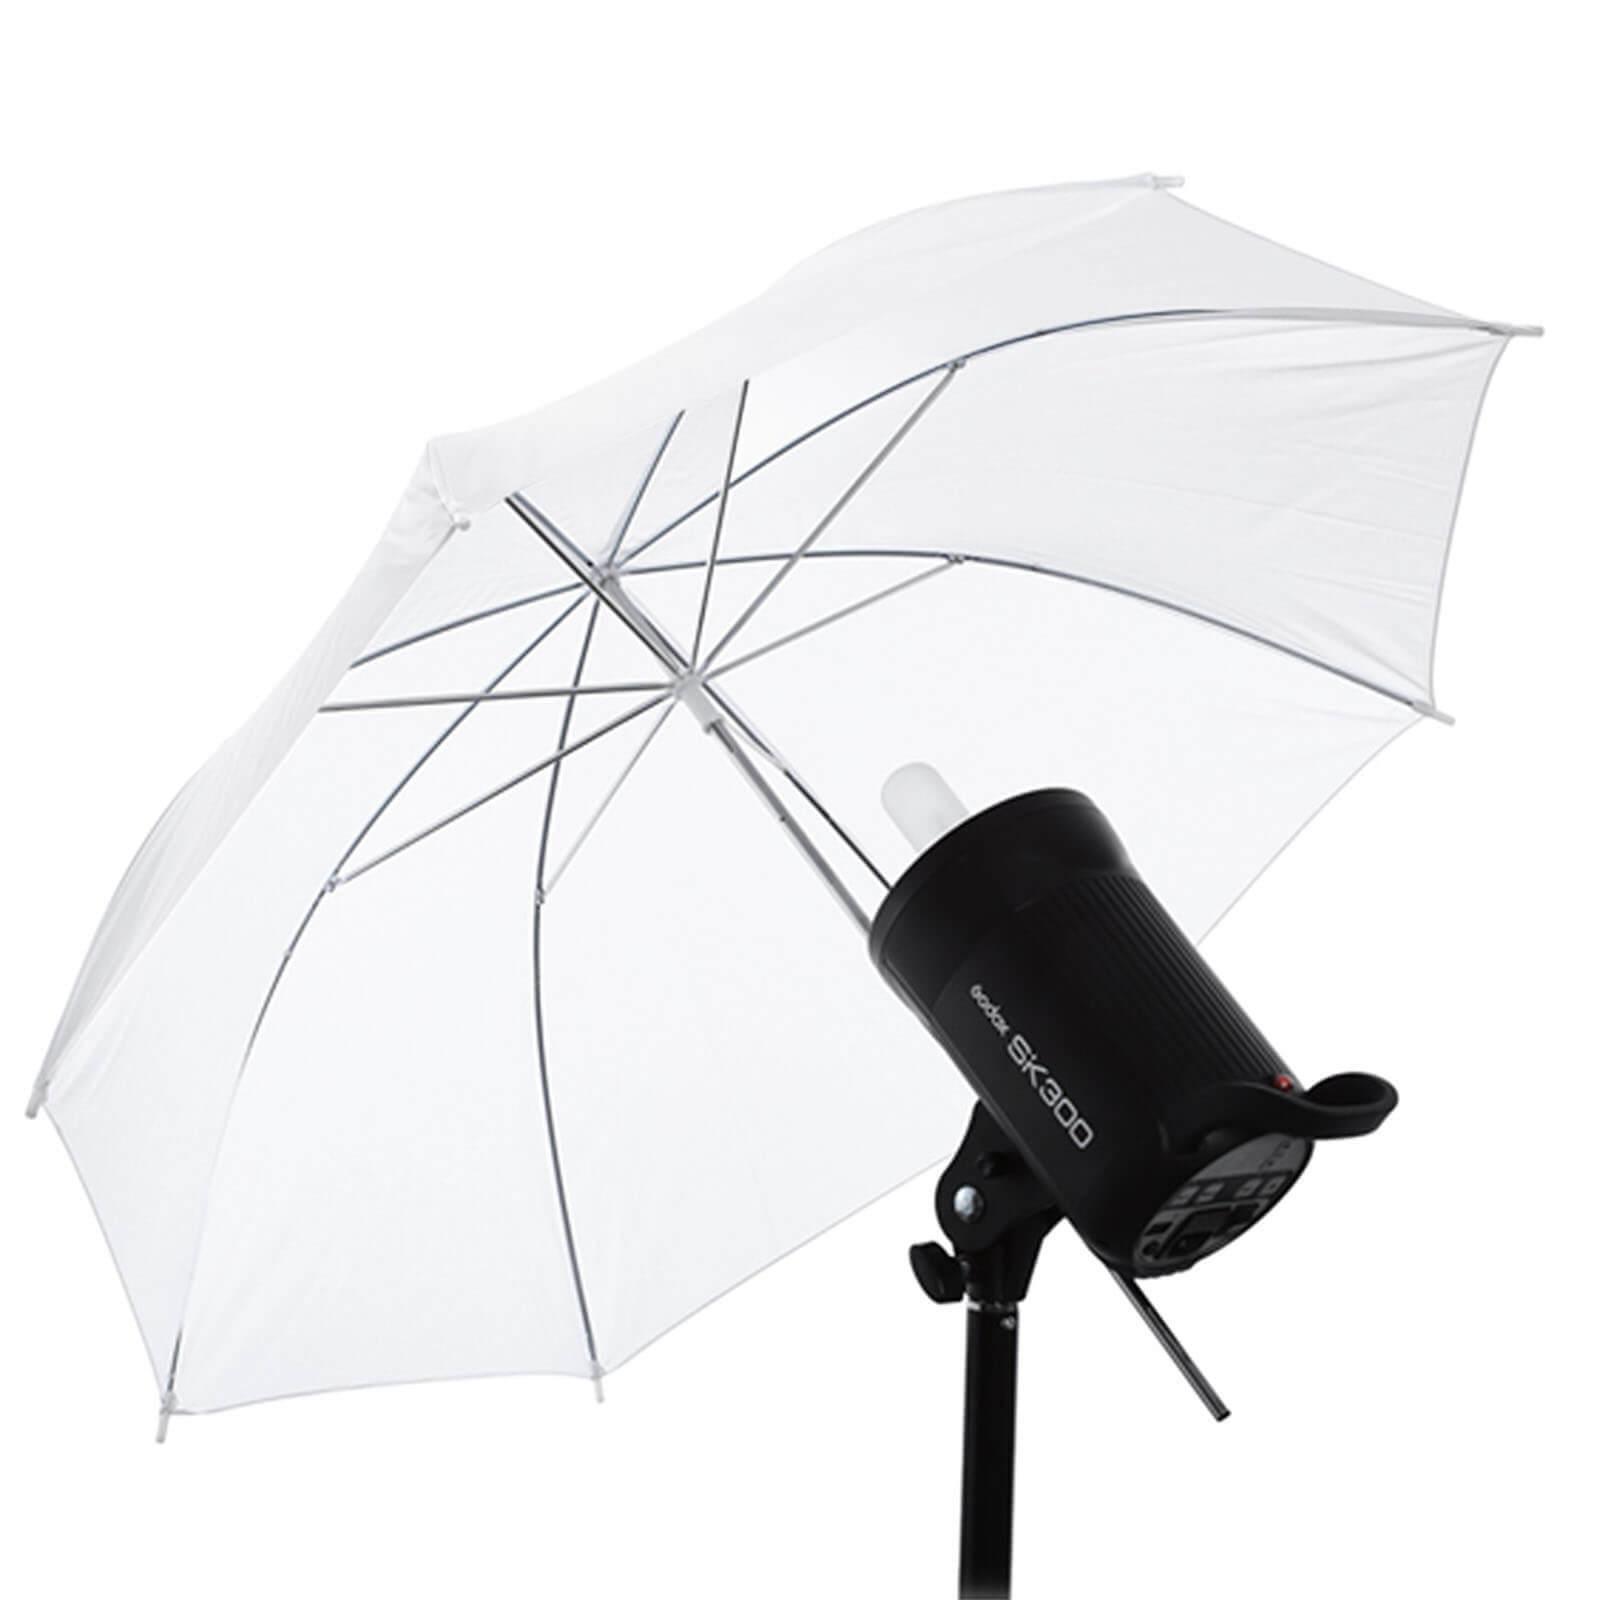 33 inch Translucent Photography Soft Light Photo Studio Video Umbrella